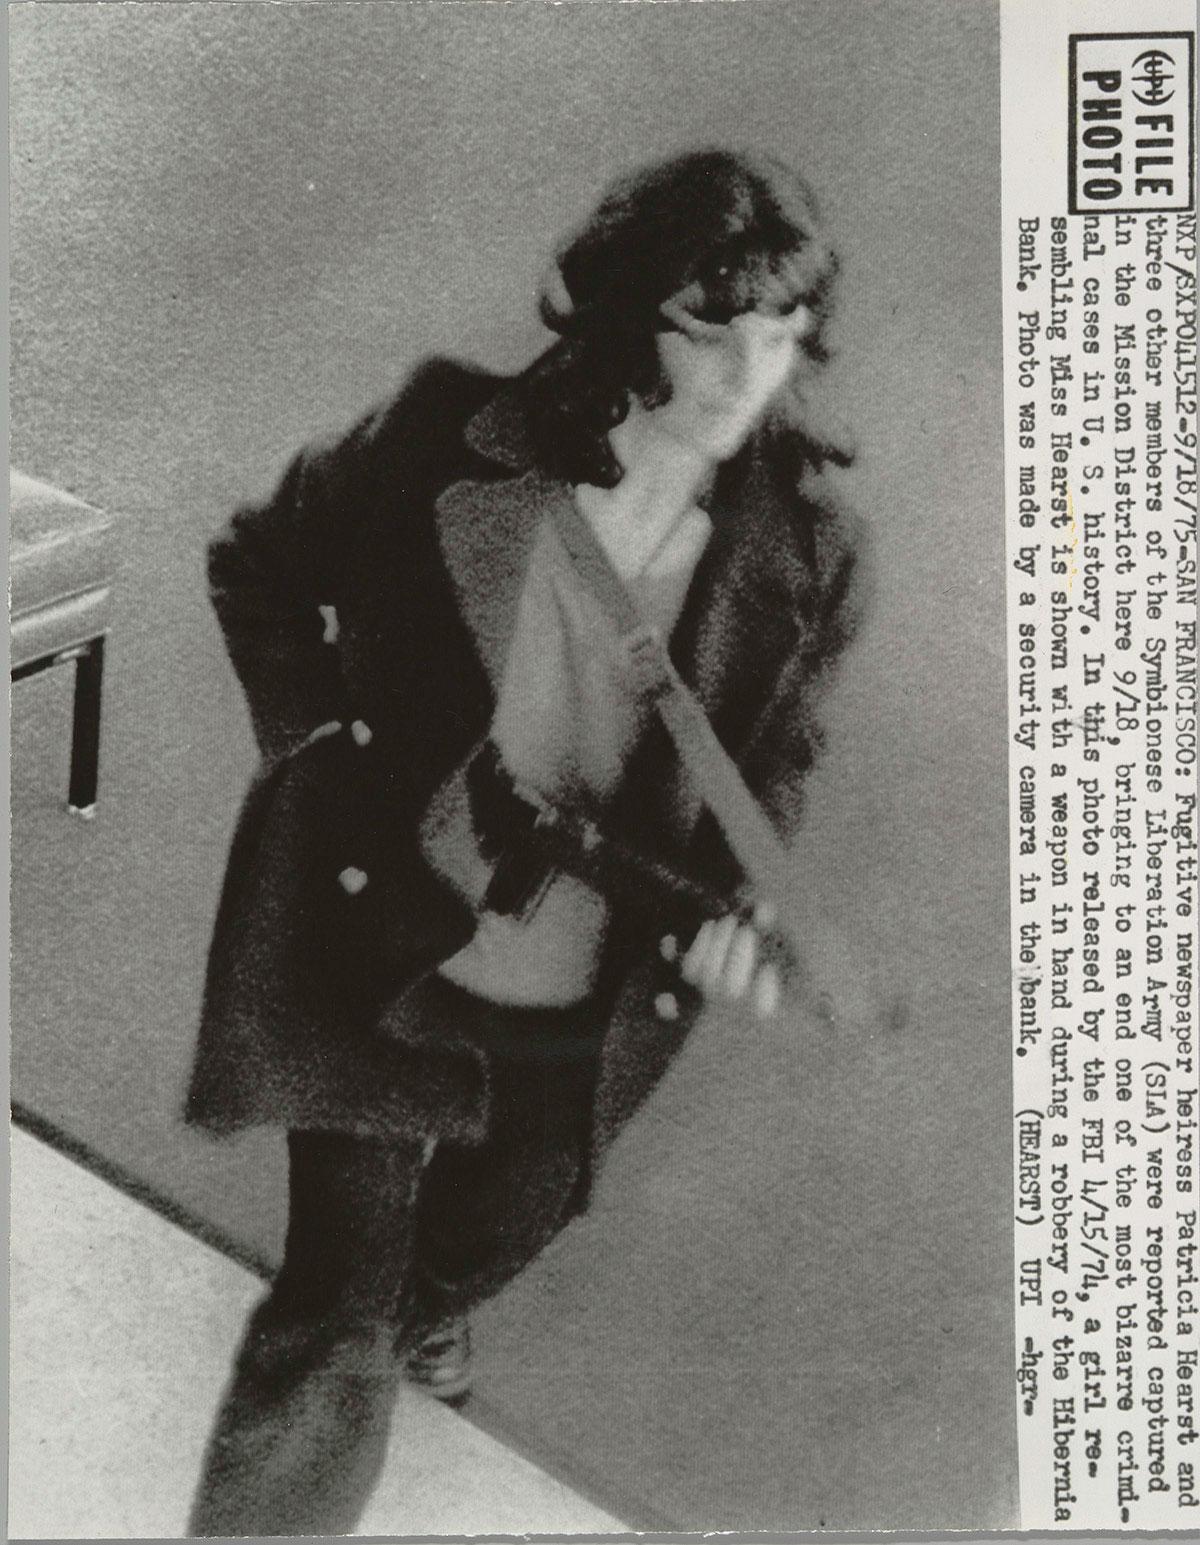 Patricia (Patty) Hearst during the Hibernia Bank robbery, San Francisco, 1974